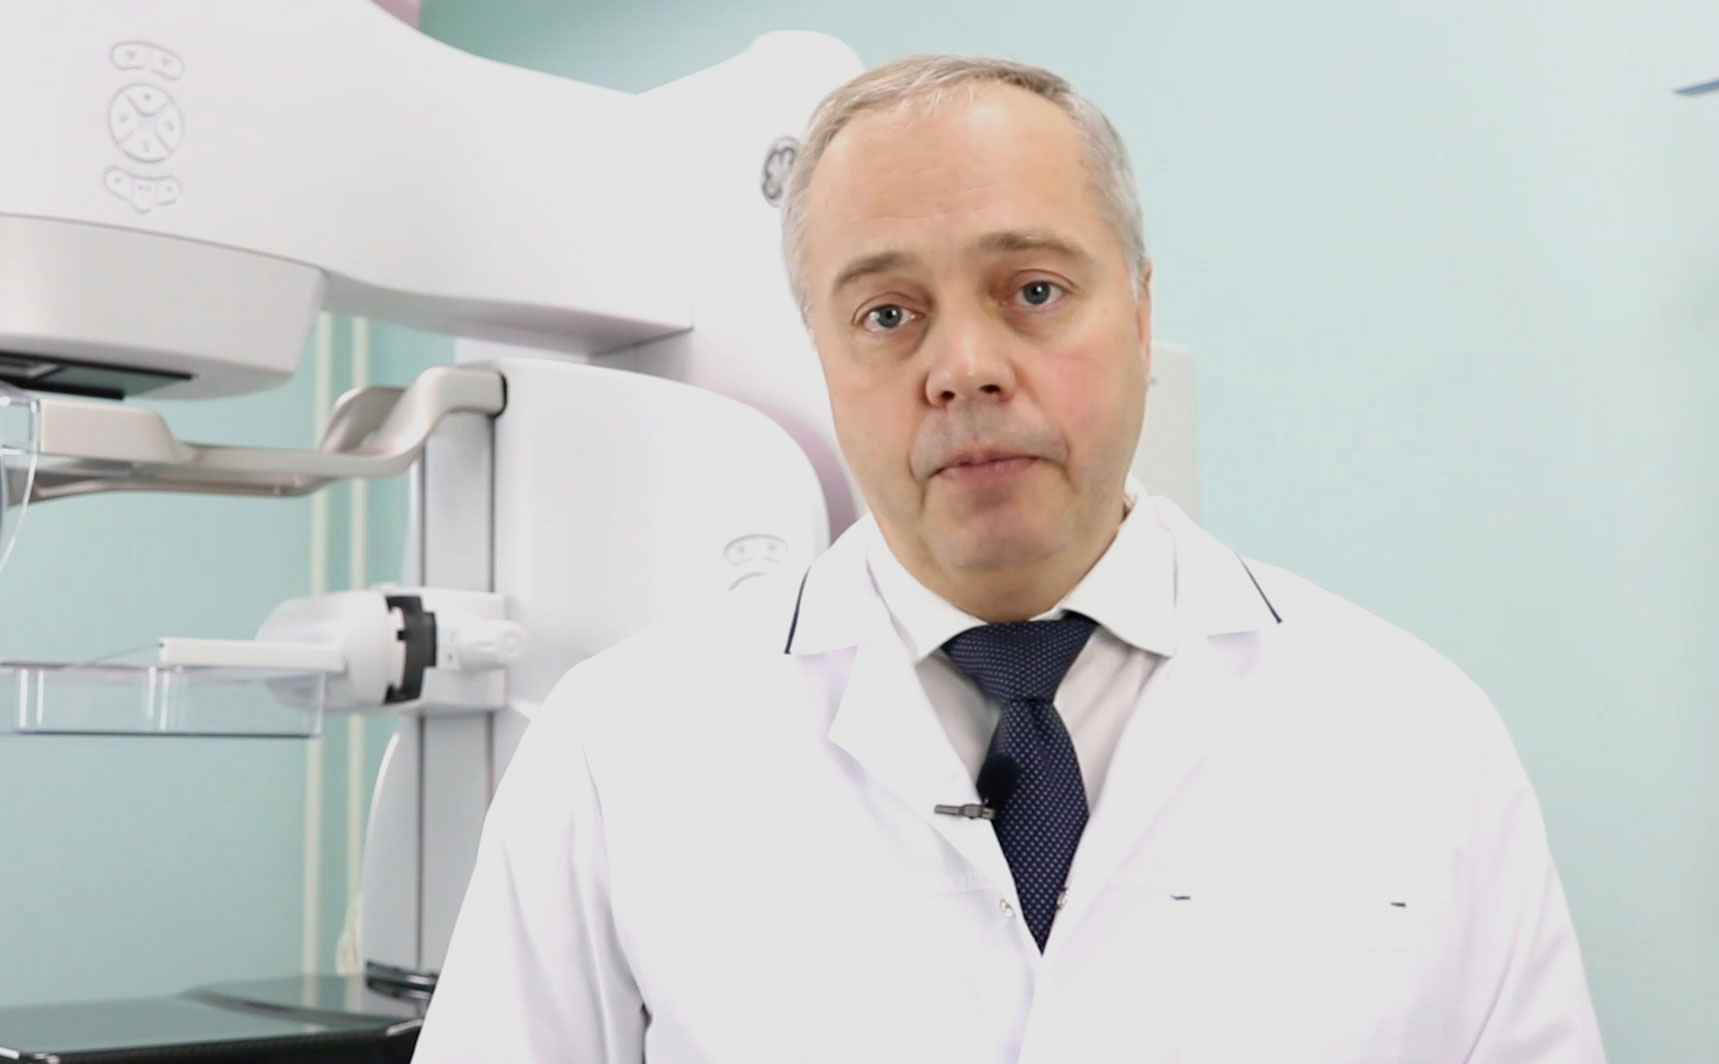 У главврача онкодиспансера Пермского края выявили коронавирус